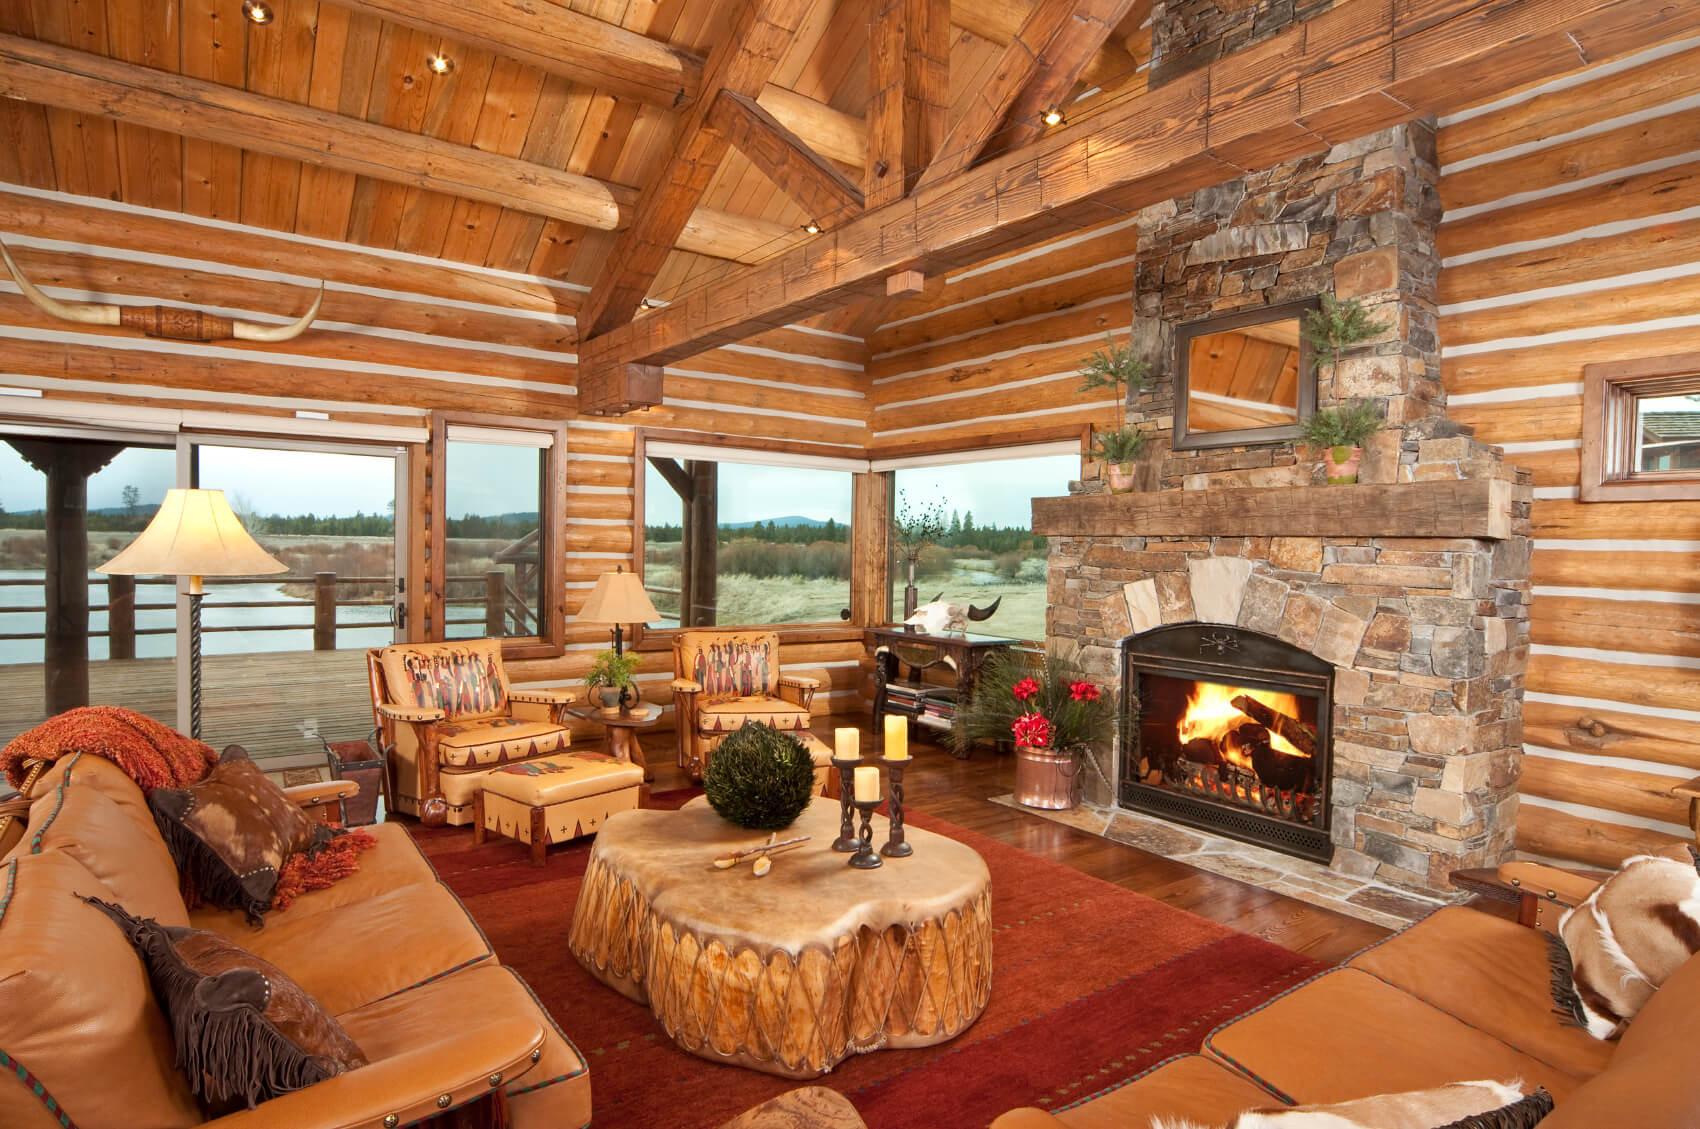 Rustic Living Room Photos  25 Sublime Rustic Living Room Design Ideas